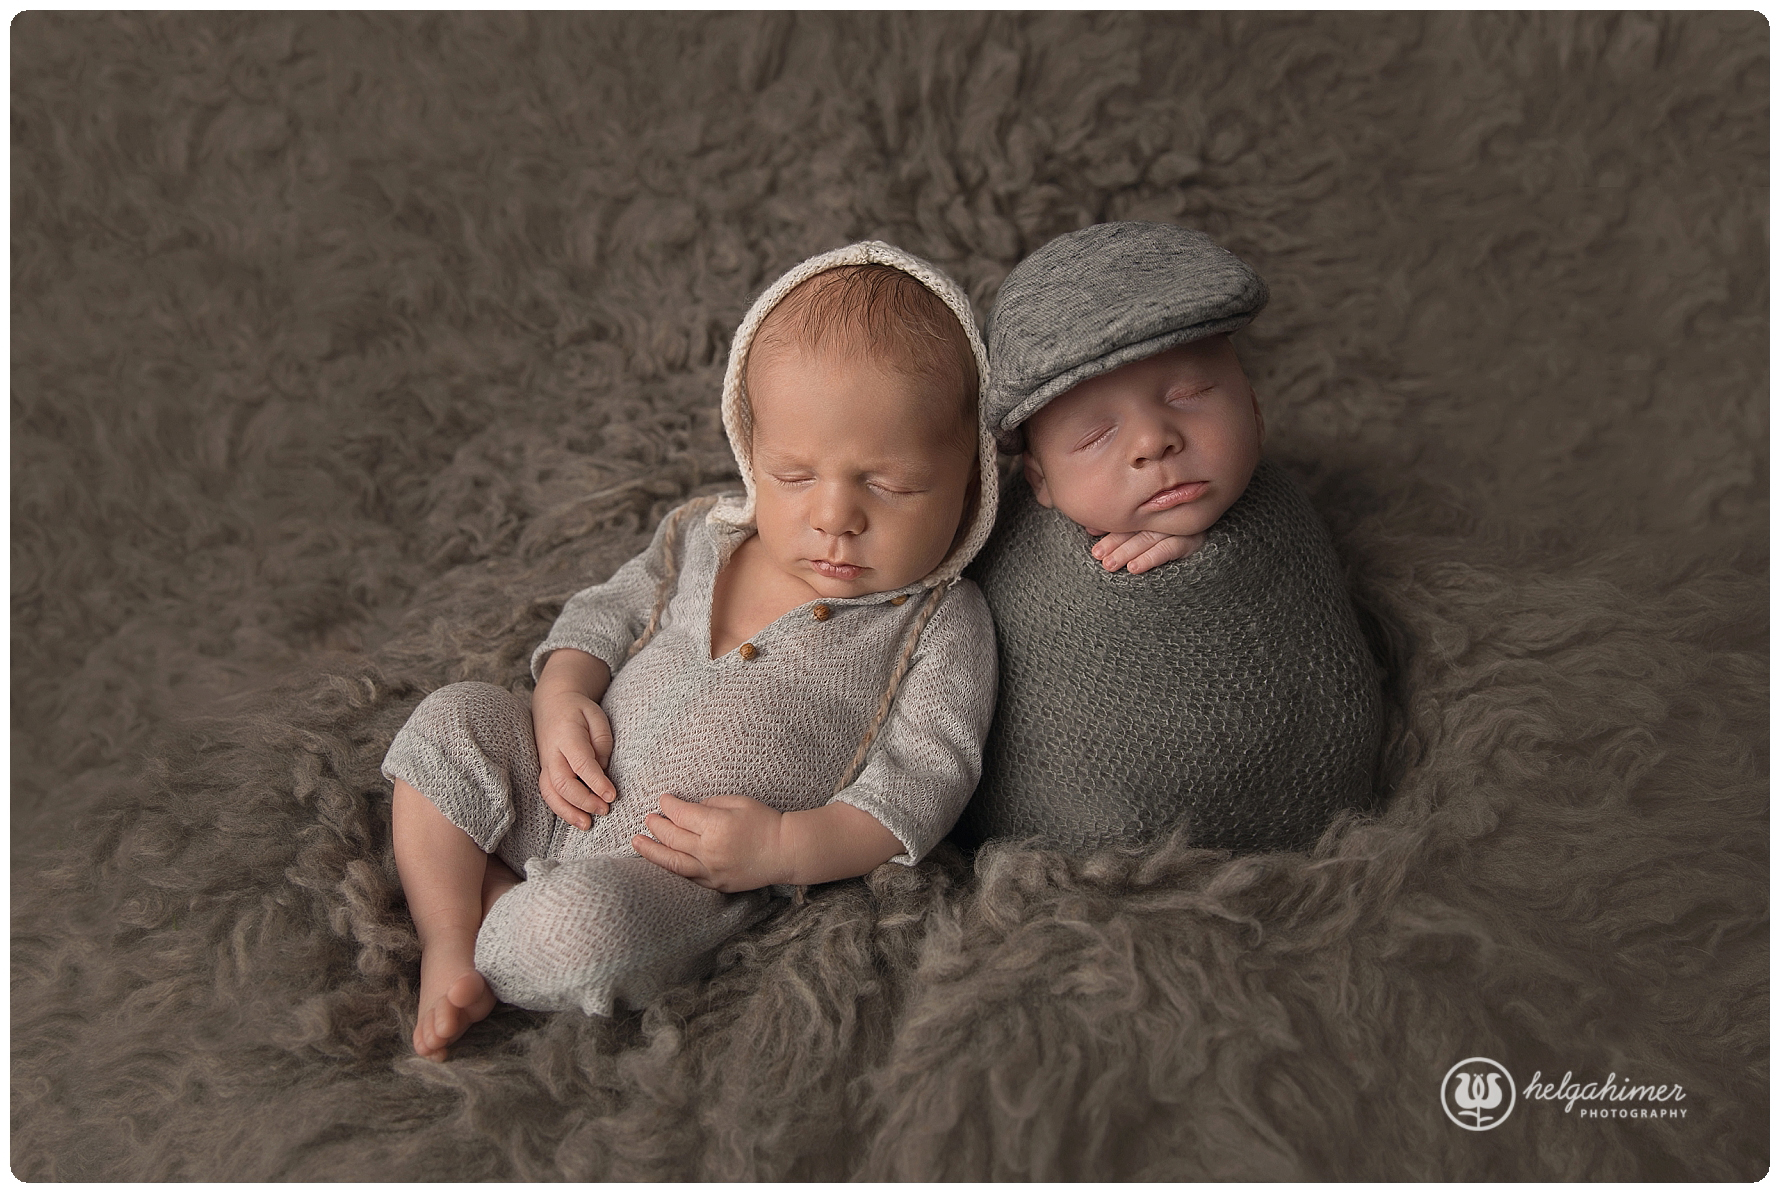 miajoy-flokati-patatosack-sittingnewborns-twins-newborn-photography-helgahimer-sudbury